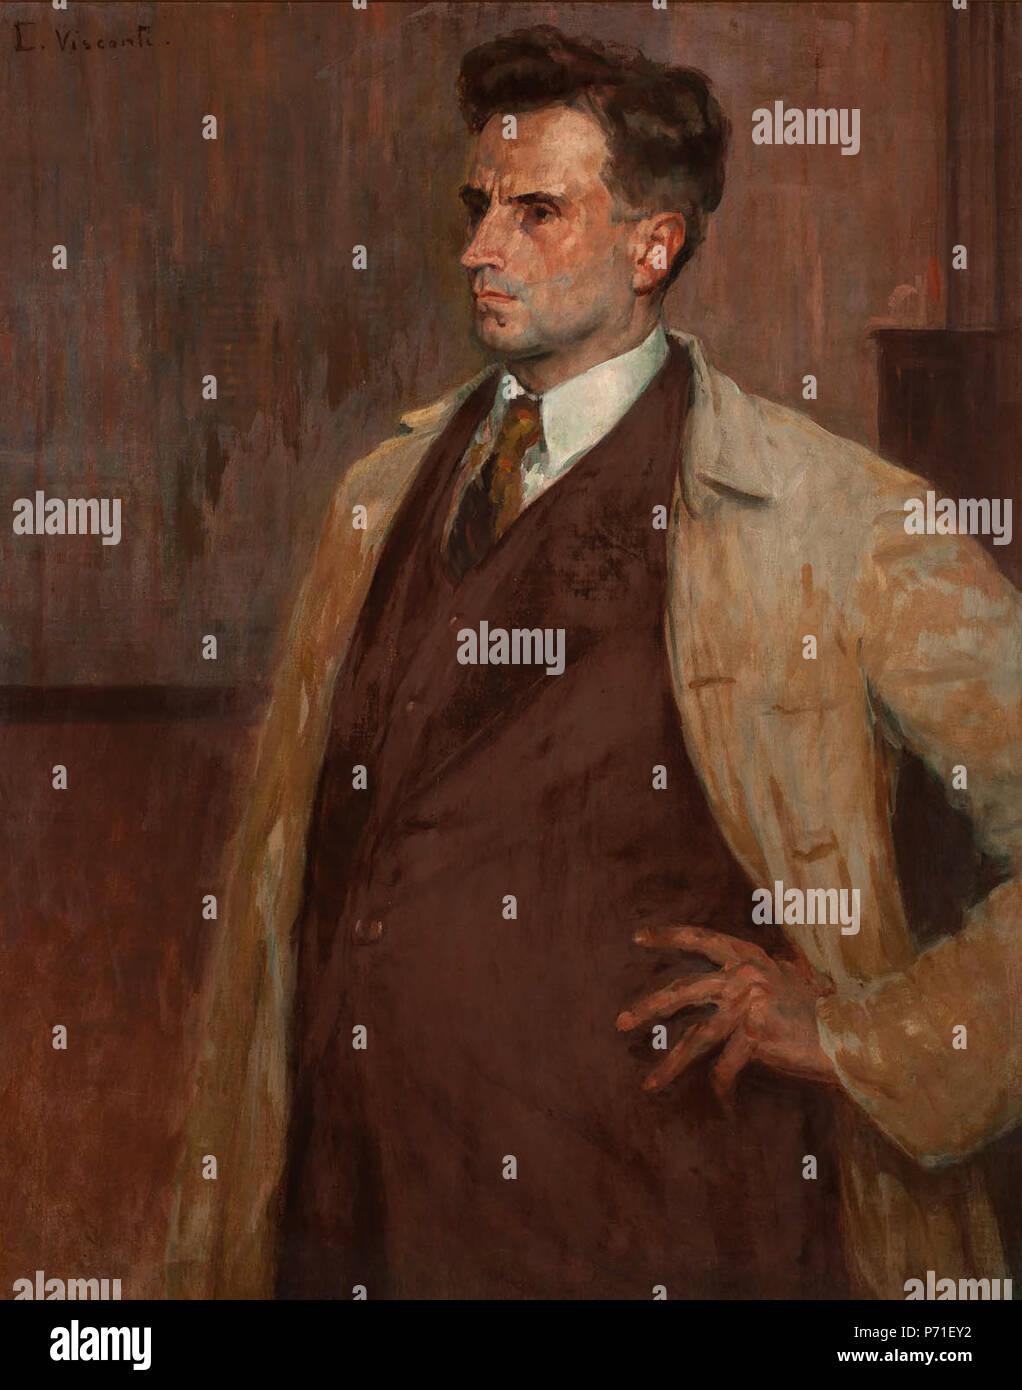 14 Eliseu Visconti - Retrato do escultor João Zacco Paraná - Stock Image